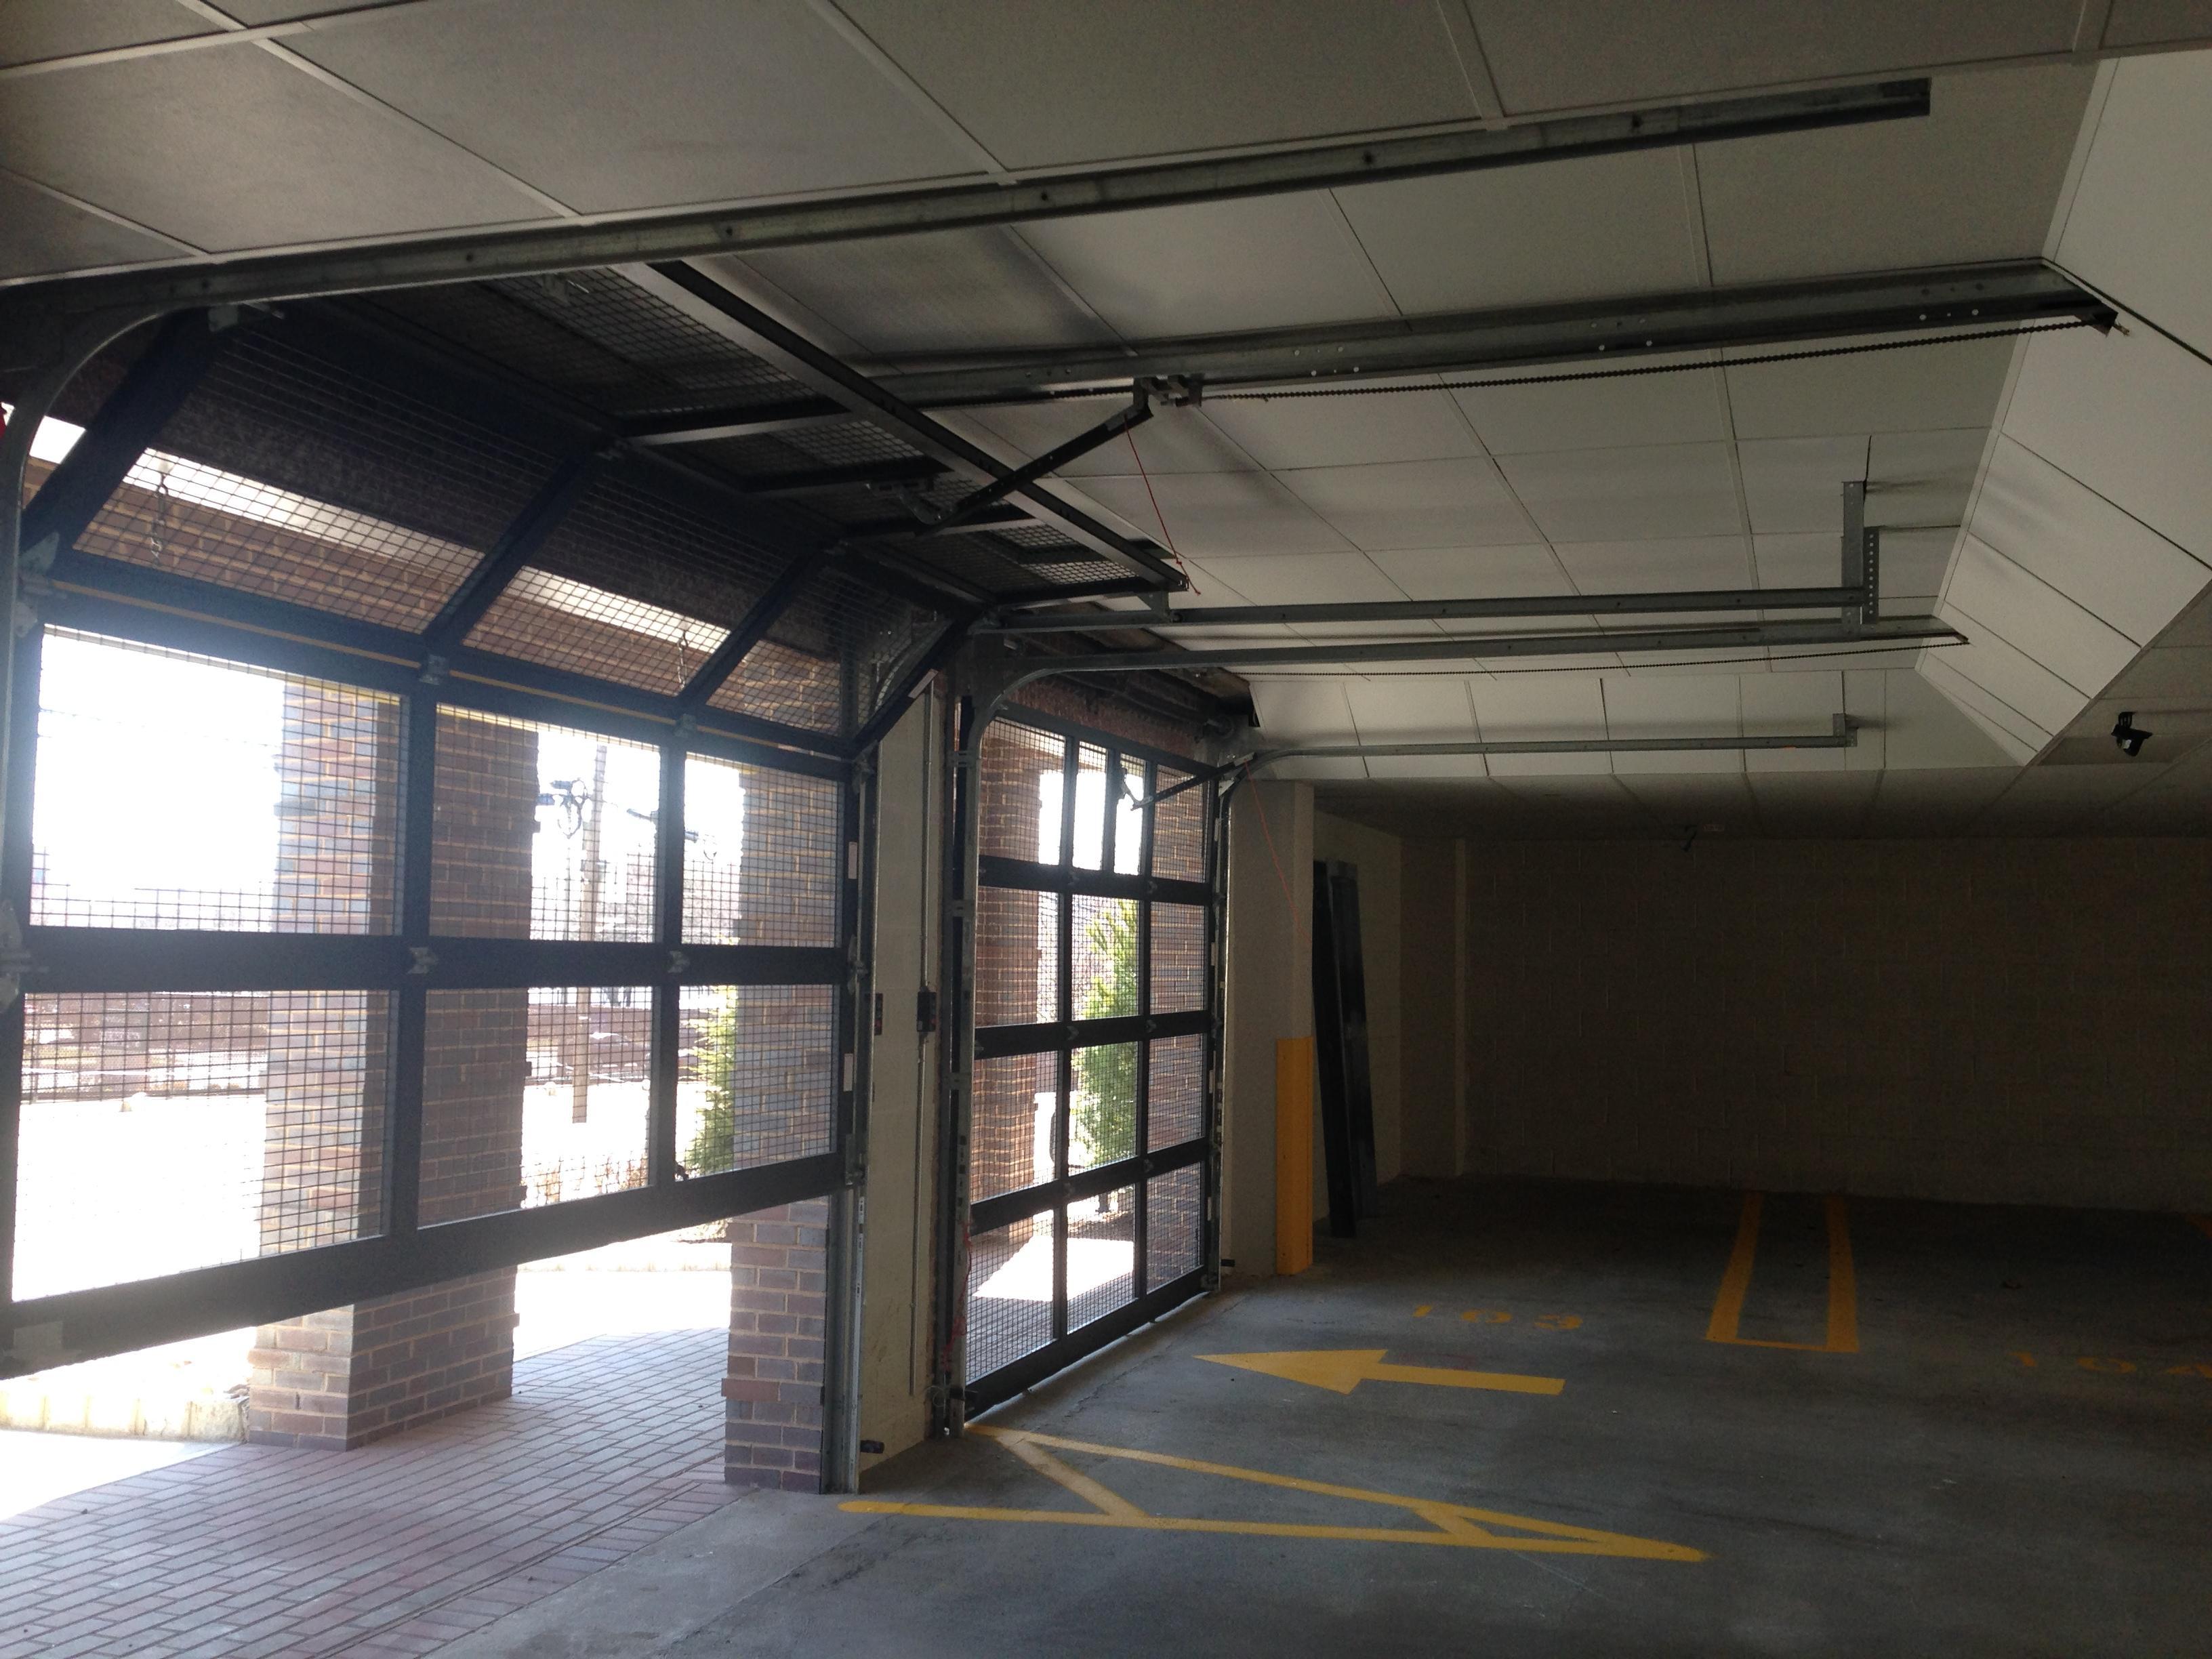 aluminum-wire-mesh-sectional-garage-door-system-nj-nyc-ny.jpg